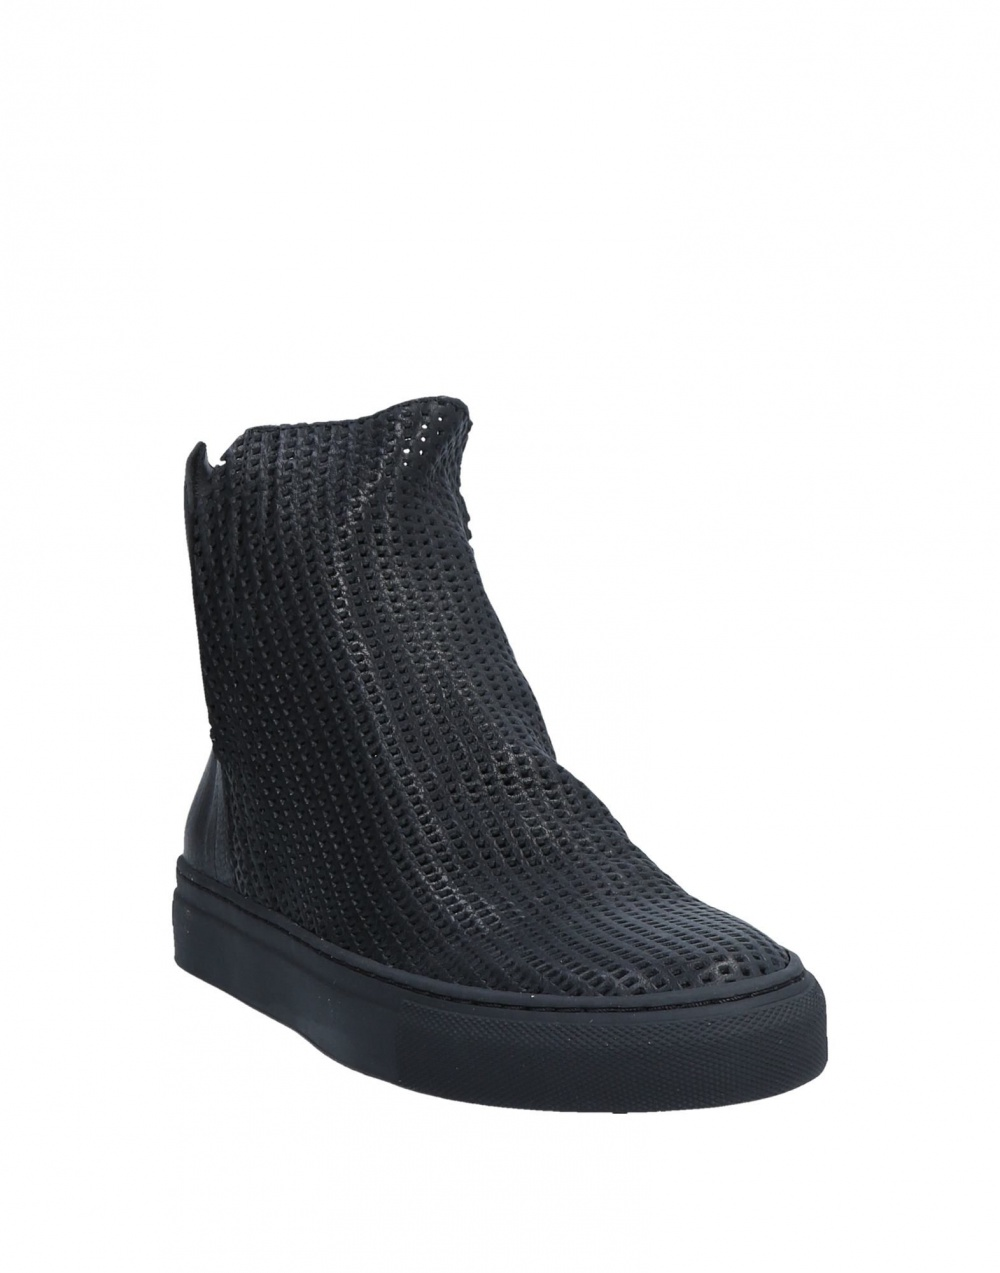 Кожаные ботинки-челси THE LAST CONSPIRACY 41 размера